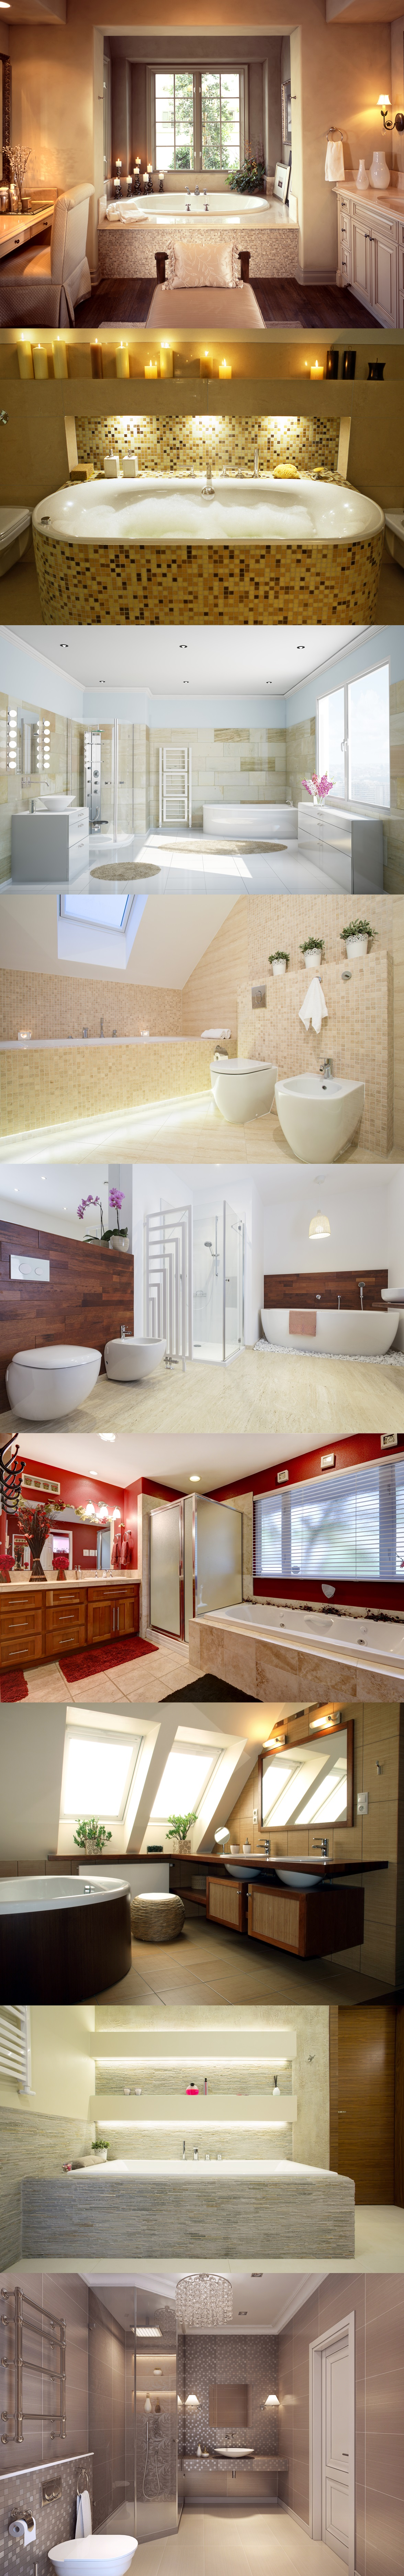 Nice Komplette Badezimmer Images Gallery >> Fliesen 30x60 Badezimmer ...